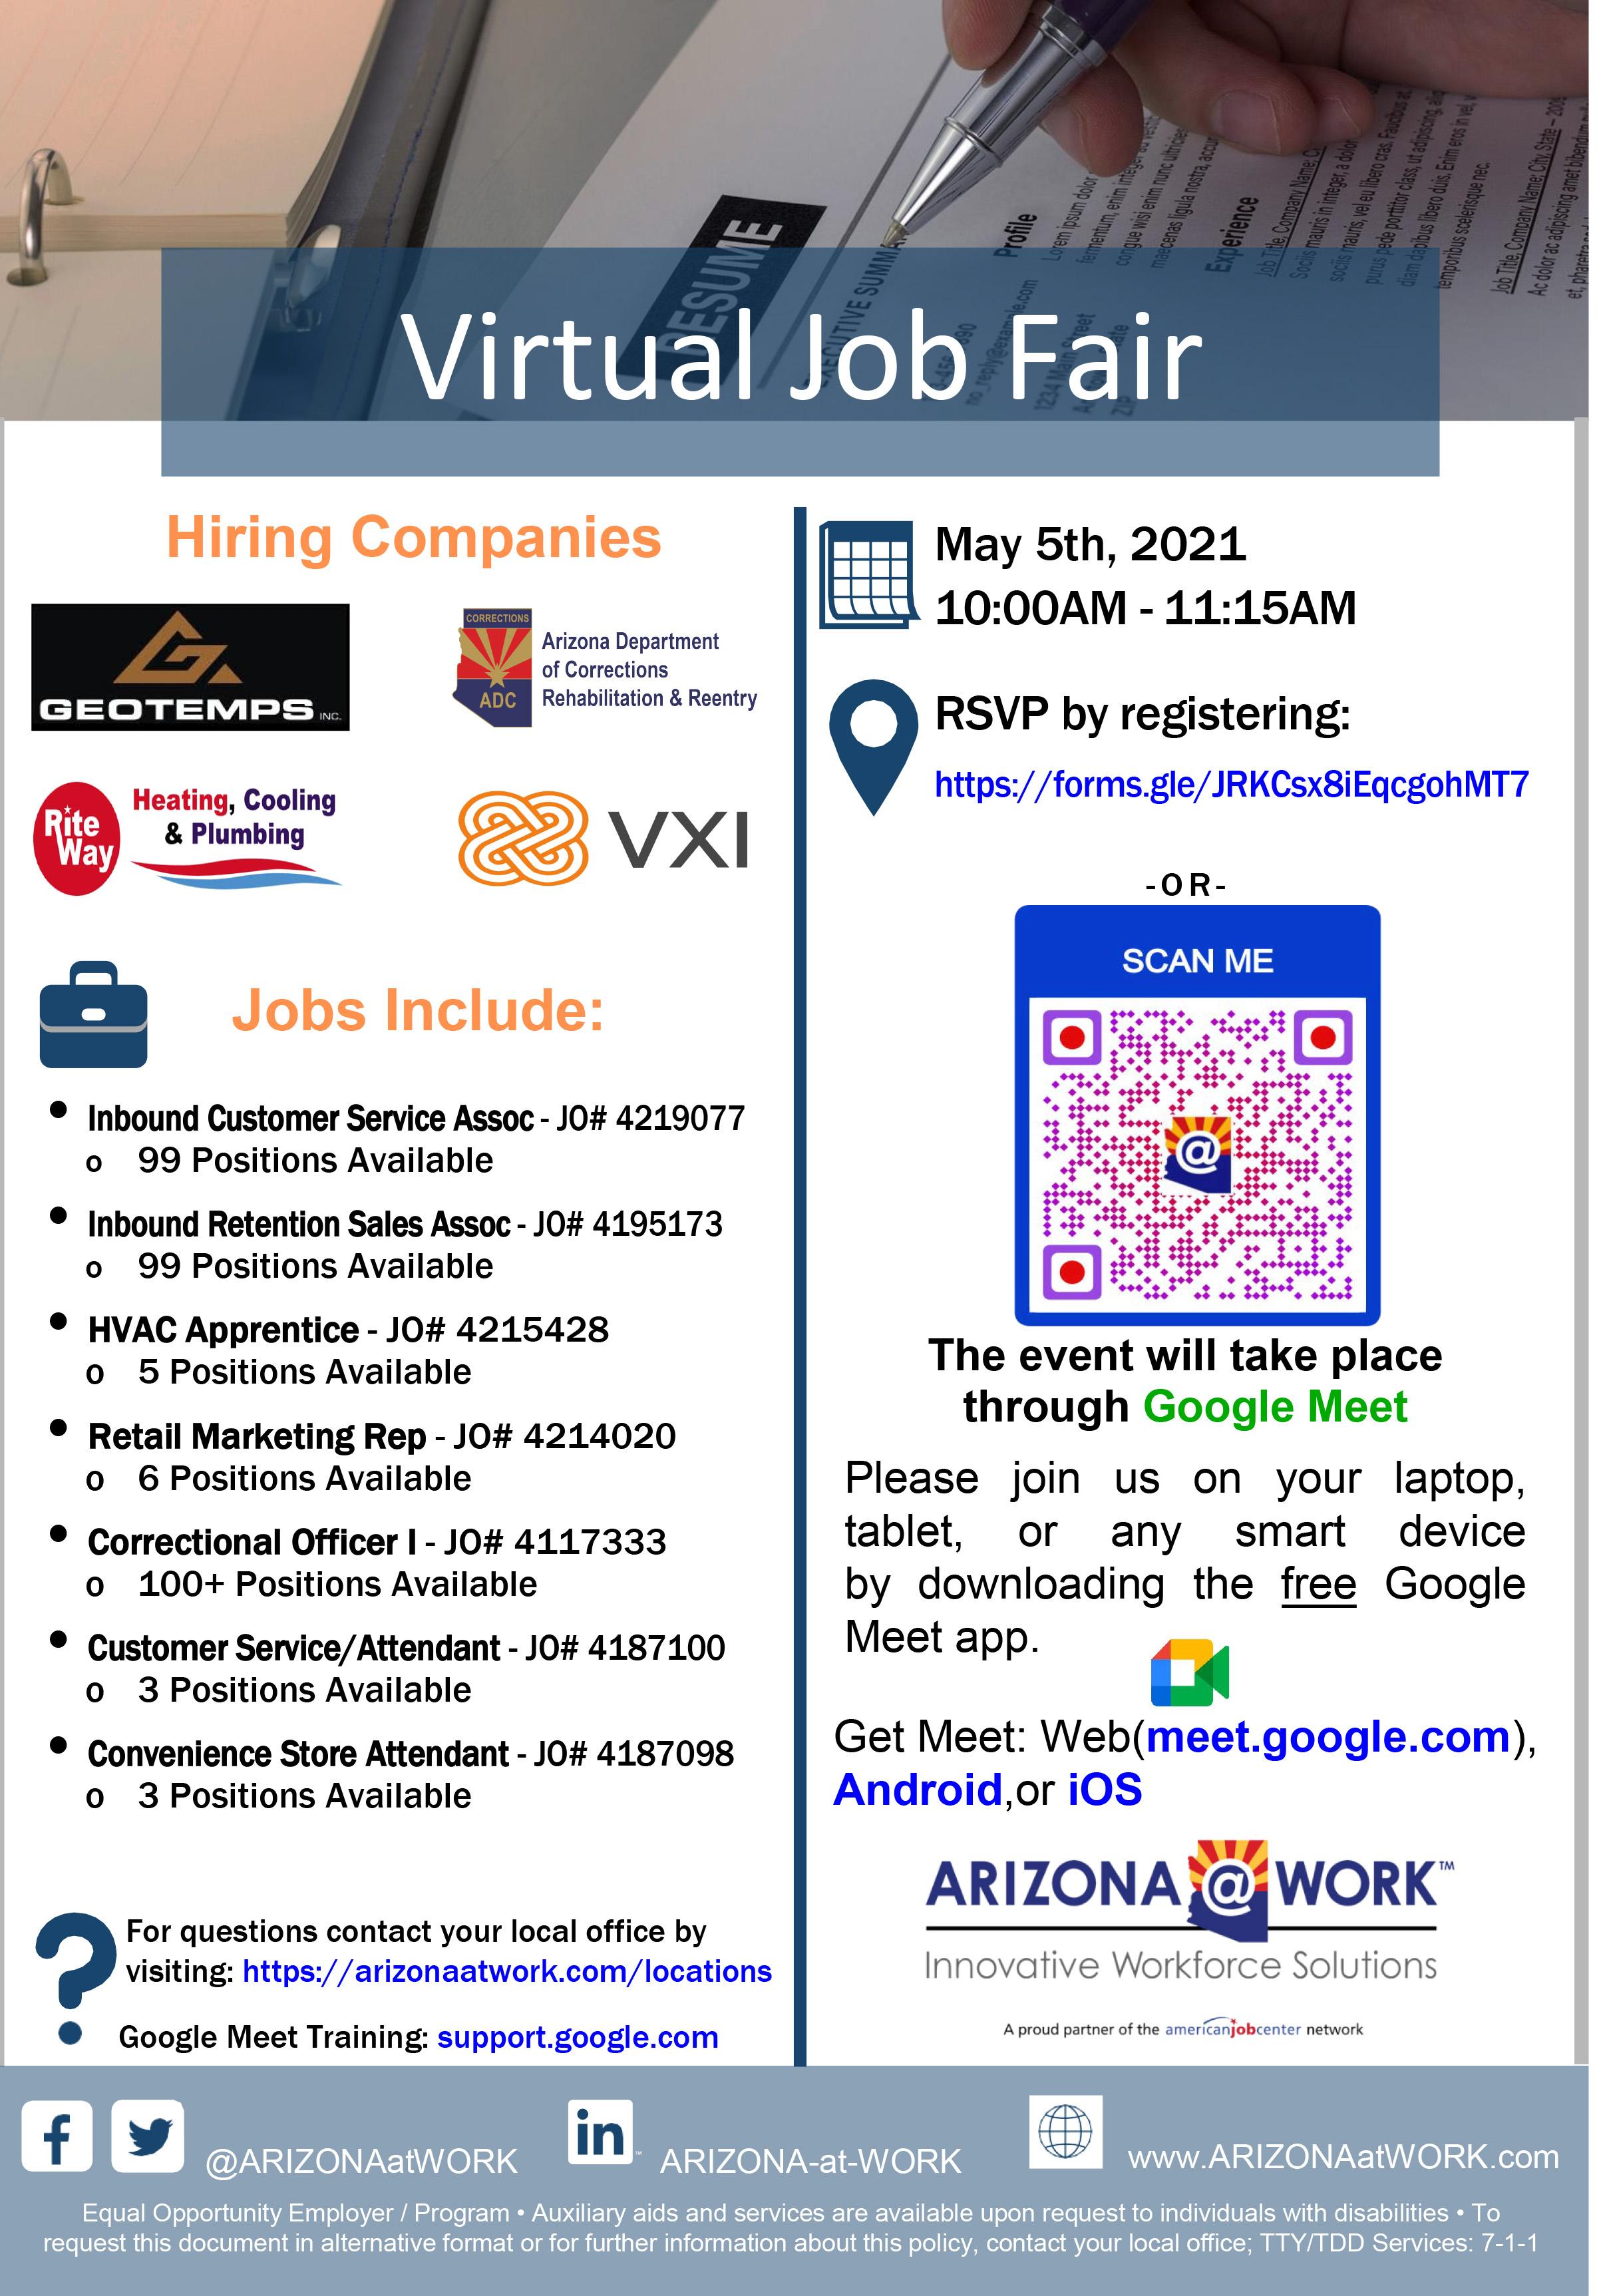 Virtual Hiring Event Flyer 05-05-2021